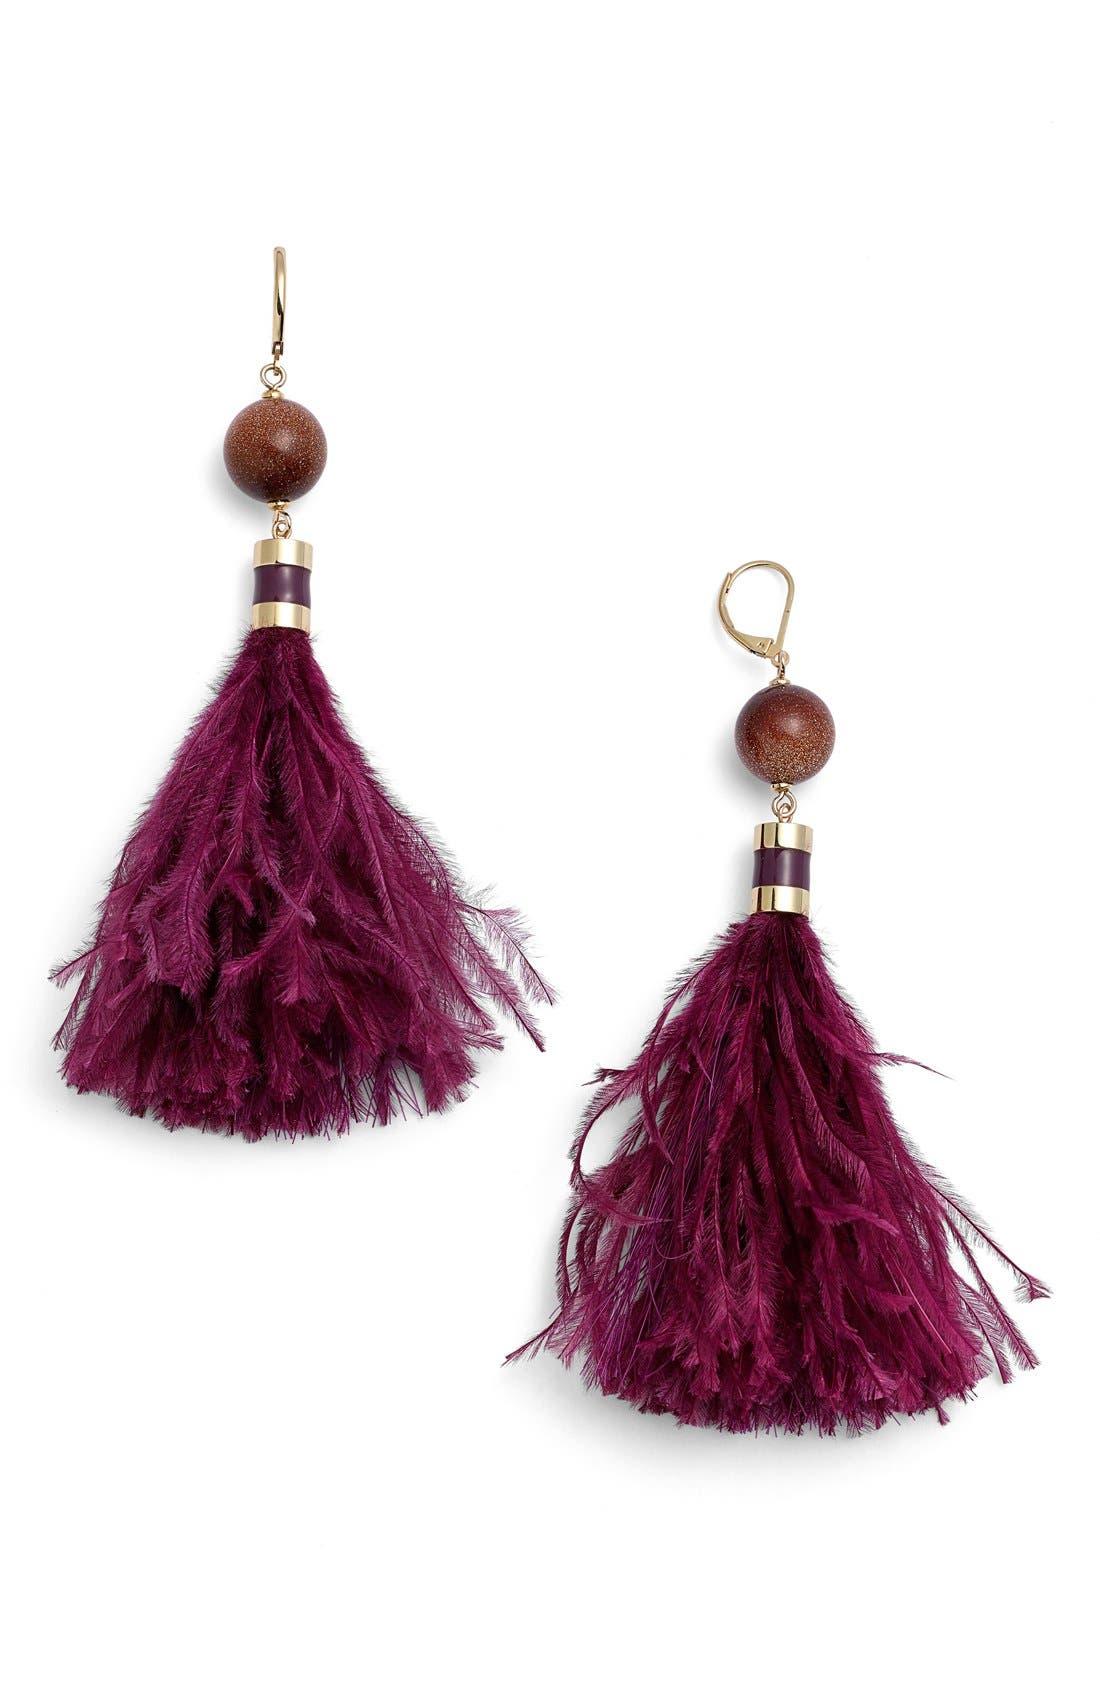 Main Image - kate spade new york 'swing time' tassel earrings